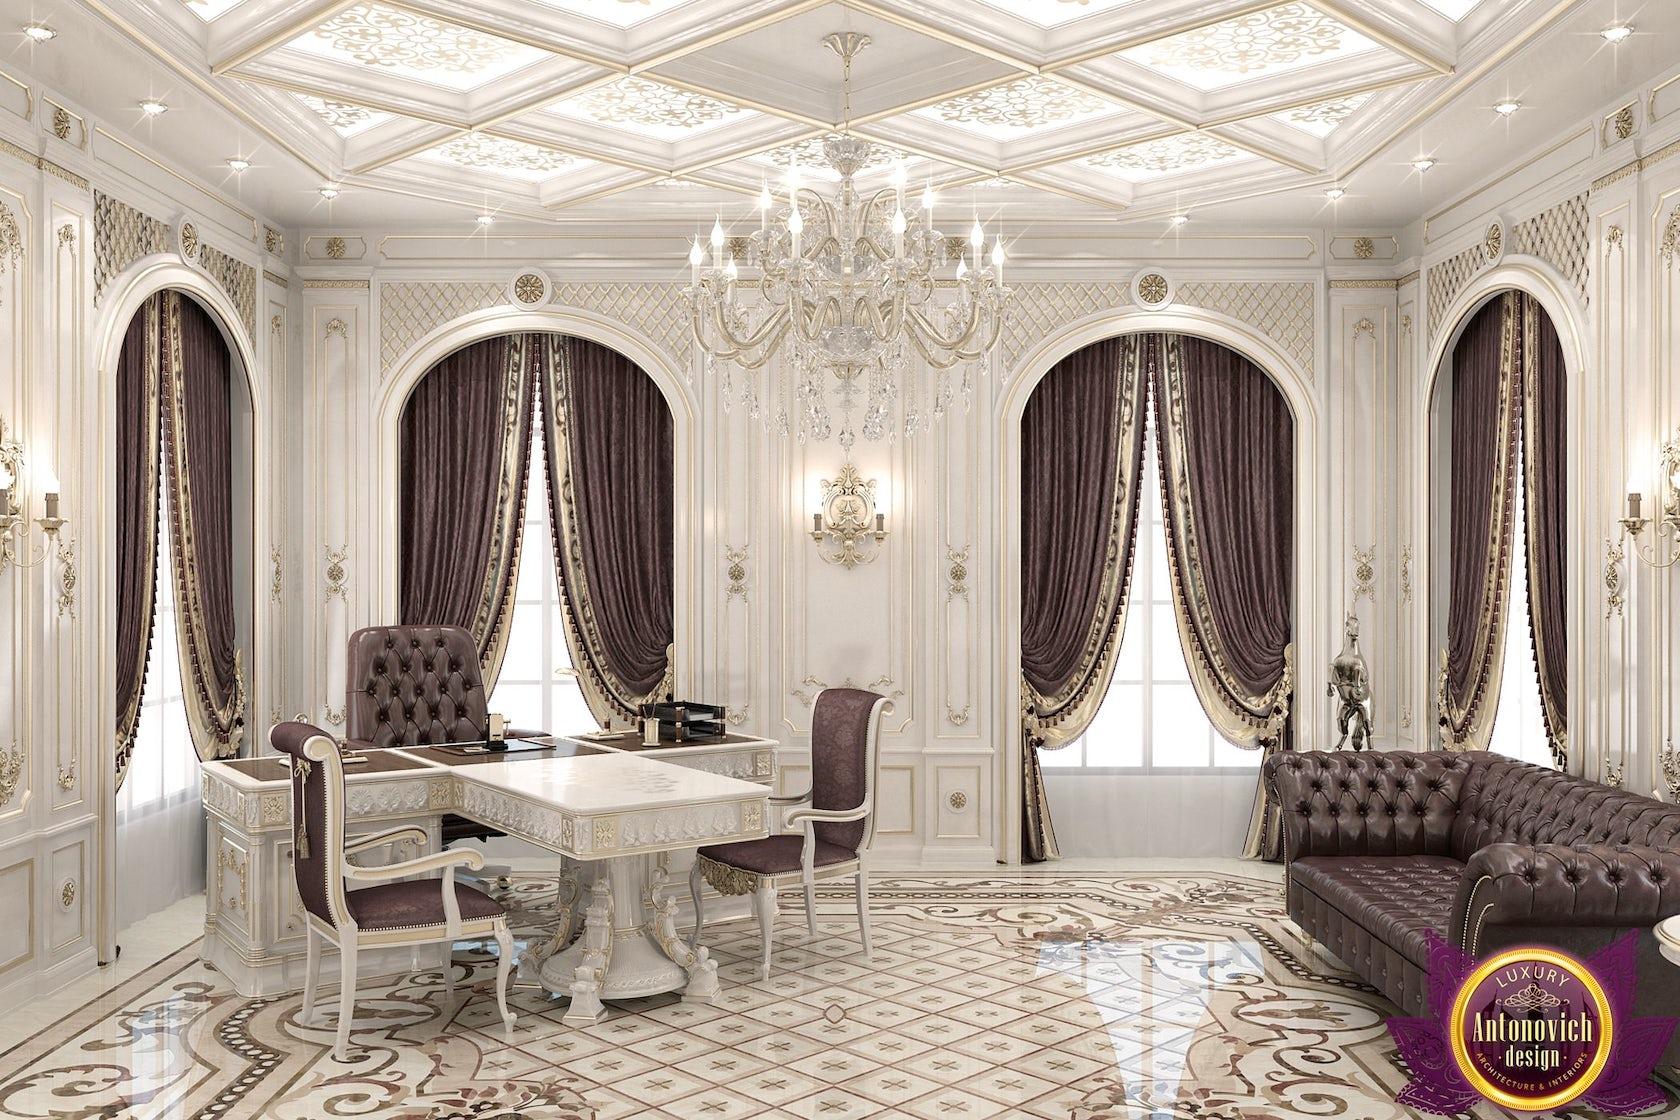 Kitchen Design Usa By Katrina Antonovich: Office Interior Design Of Katrina Antonovich